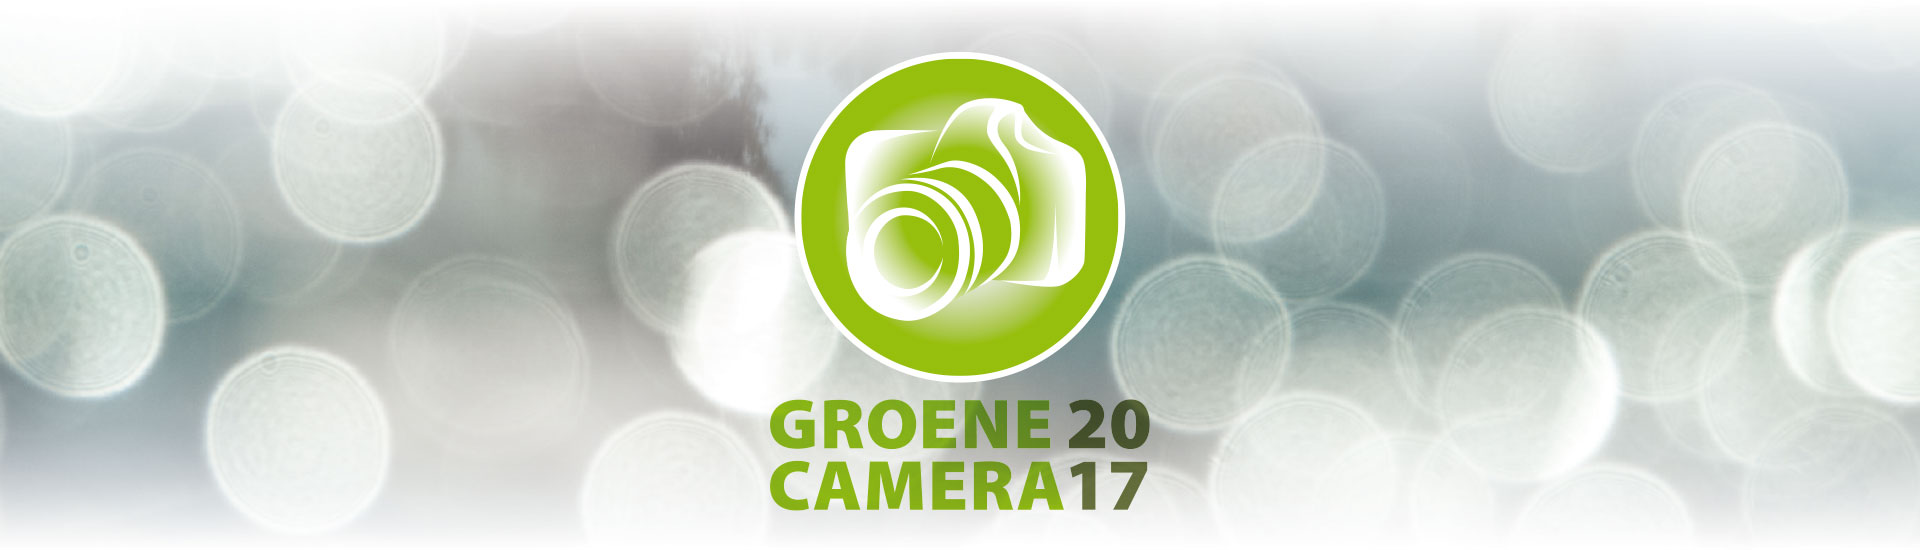 groene_camera_header_1920x550